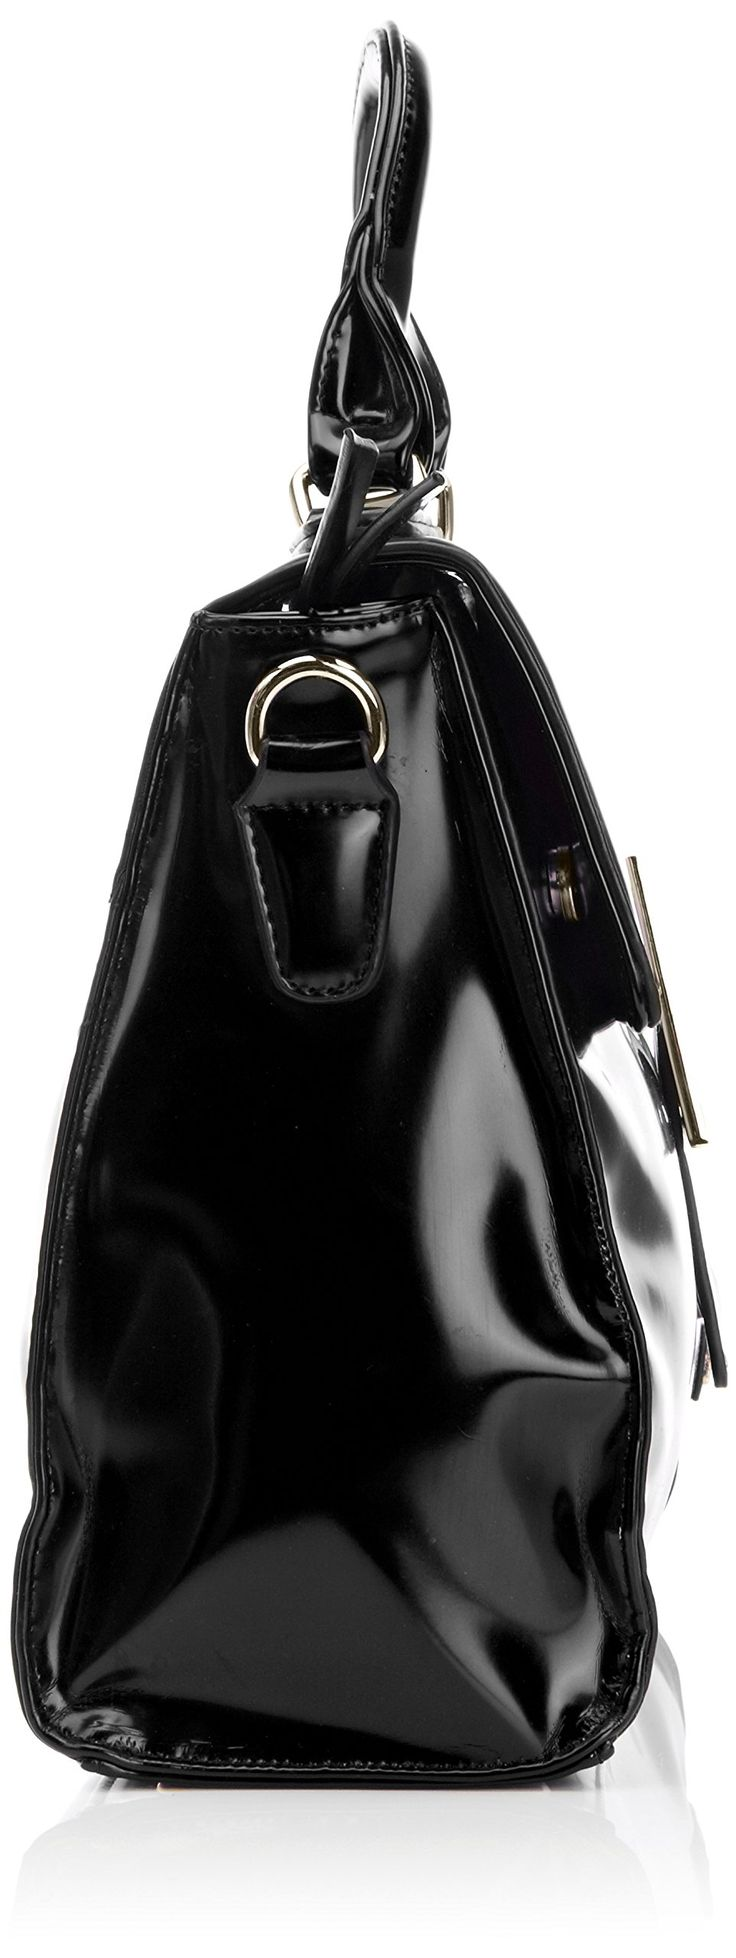 Bulaggi Women's 29732 Top-Handle Bag 29732.10 Black: Amazon.co.uk: Shoes & Bags